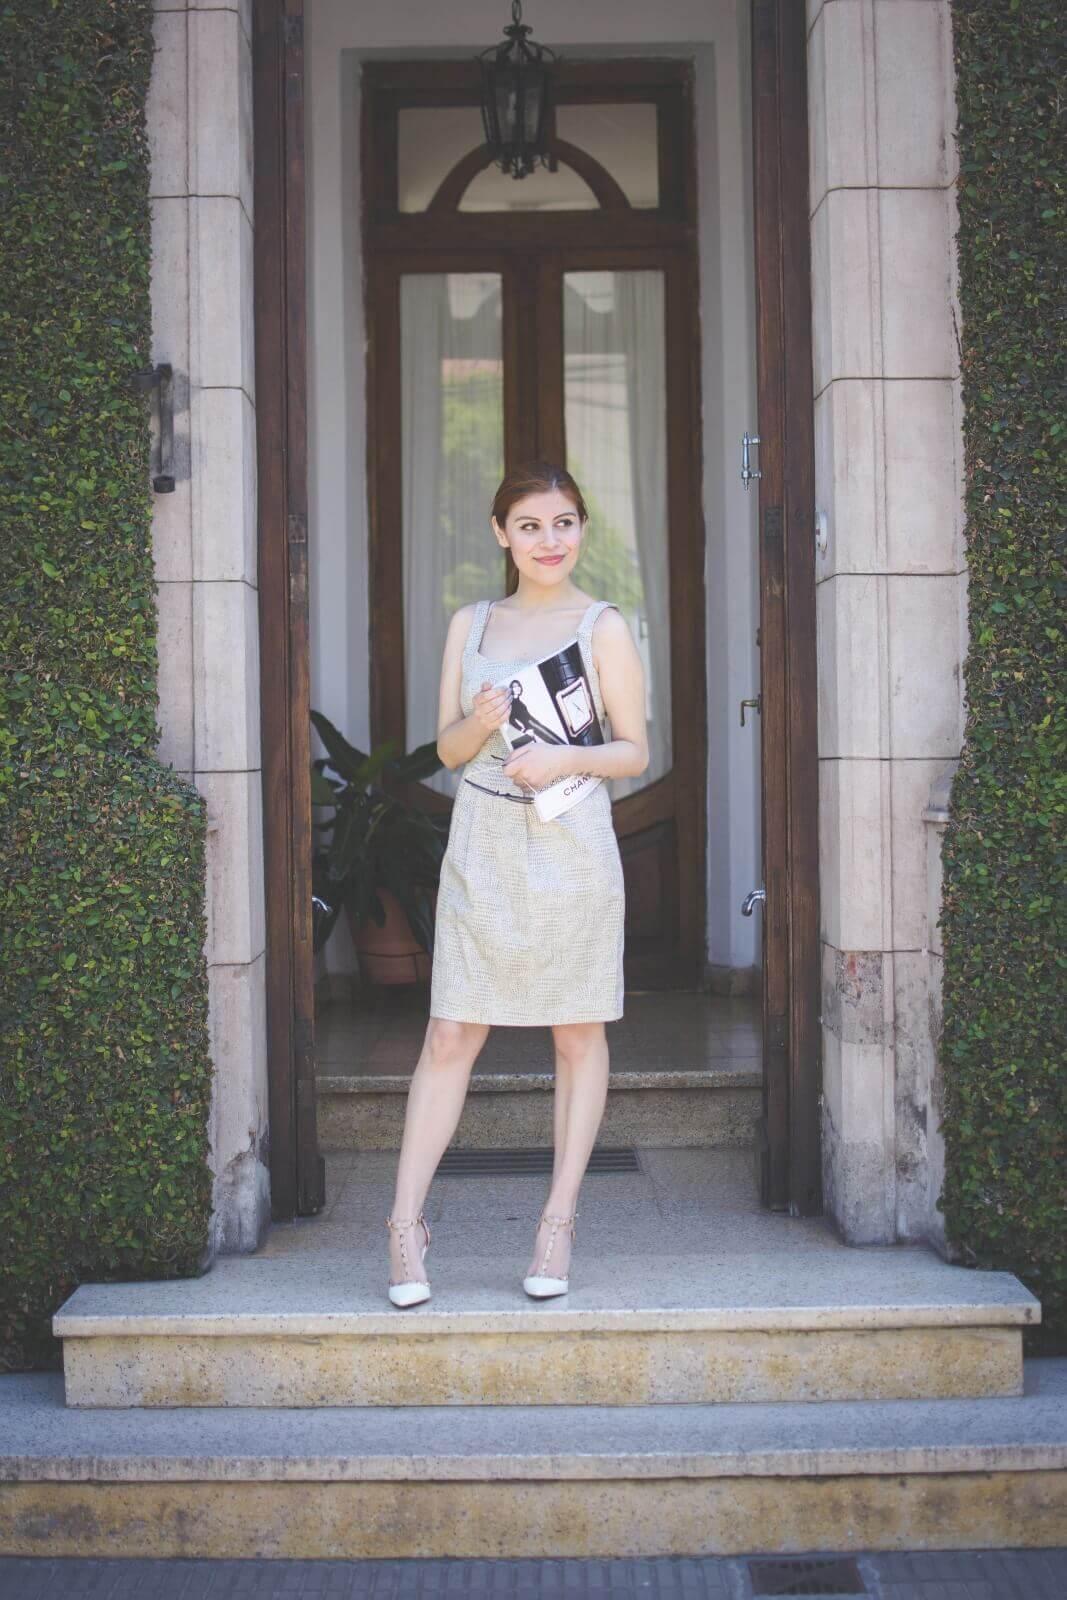 almond-white-dress-sammydress-stilettos-valentino-rockstud-imitation-deborah-ferrero-style-by-deb-ladylike18